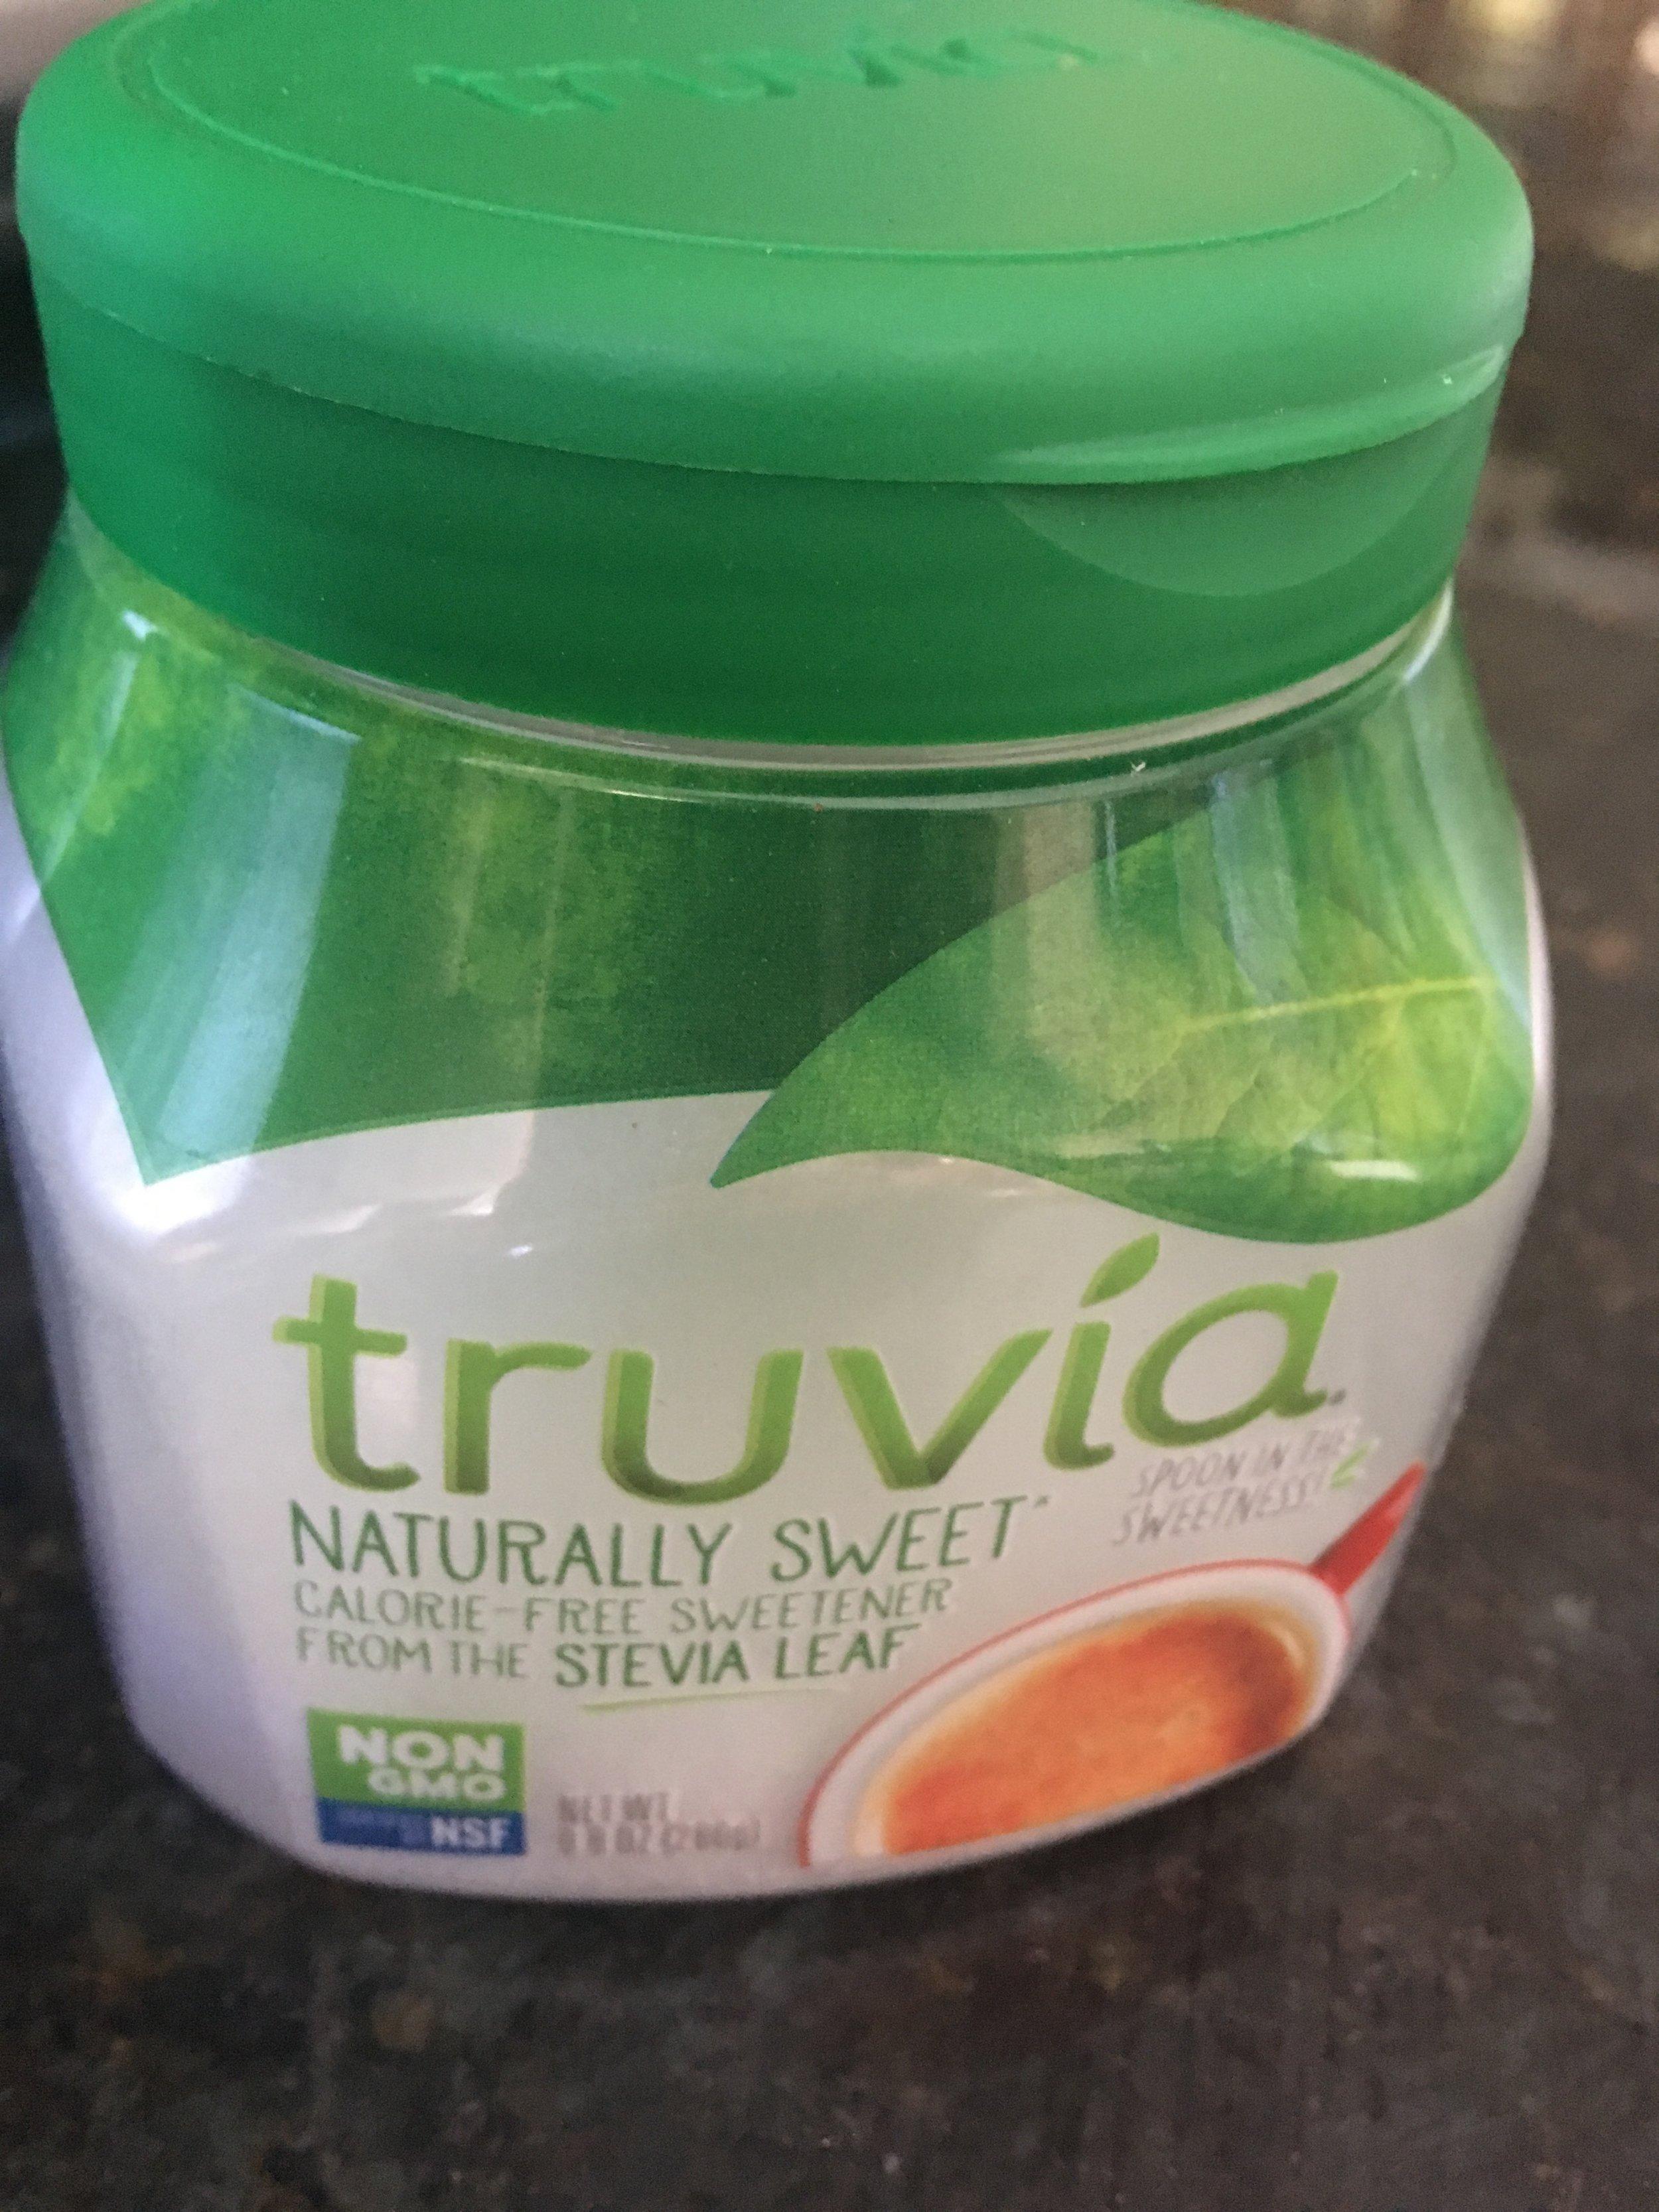 Truvia - 1 tsp or tbs